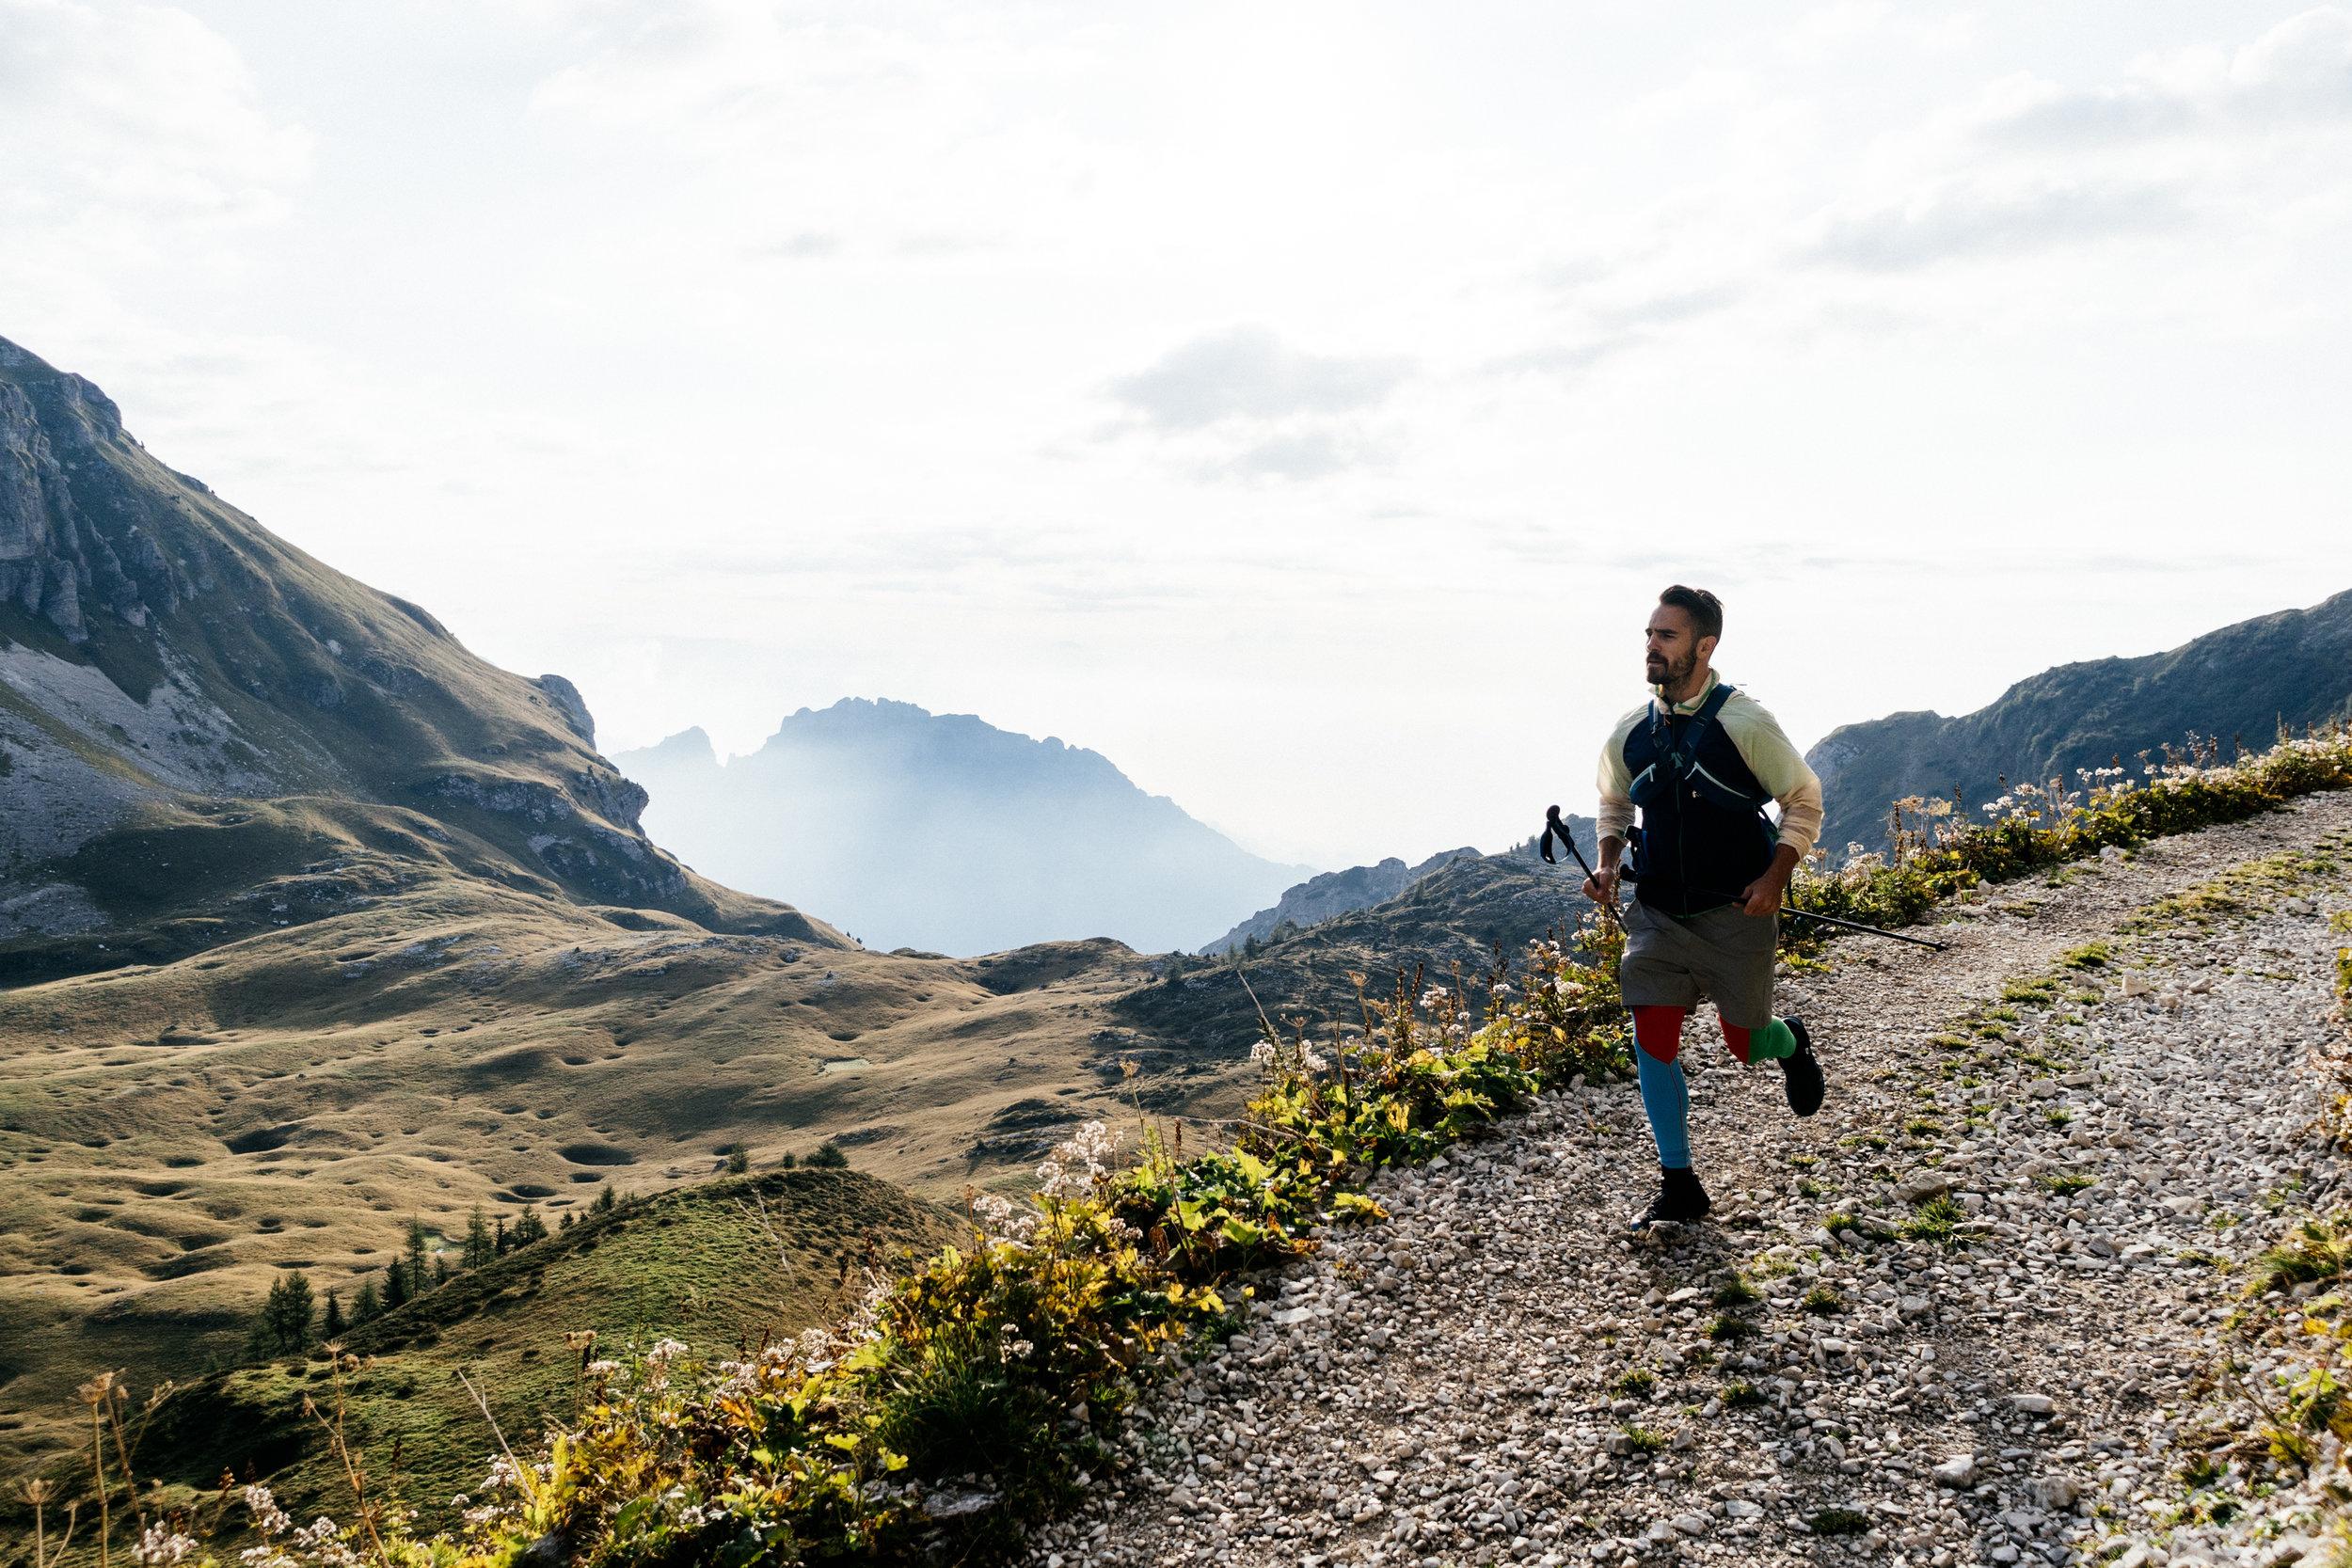 Dolomites-ChrisBrinleeJr-SEP17-3.jpg